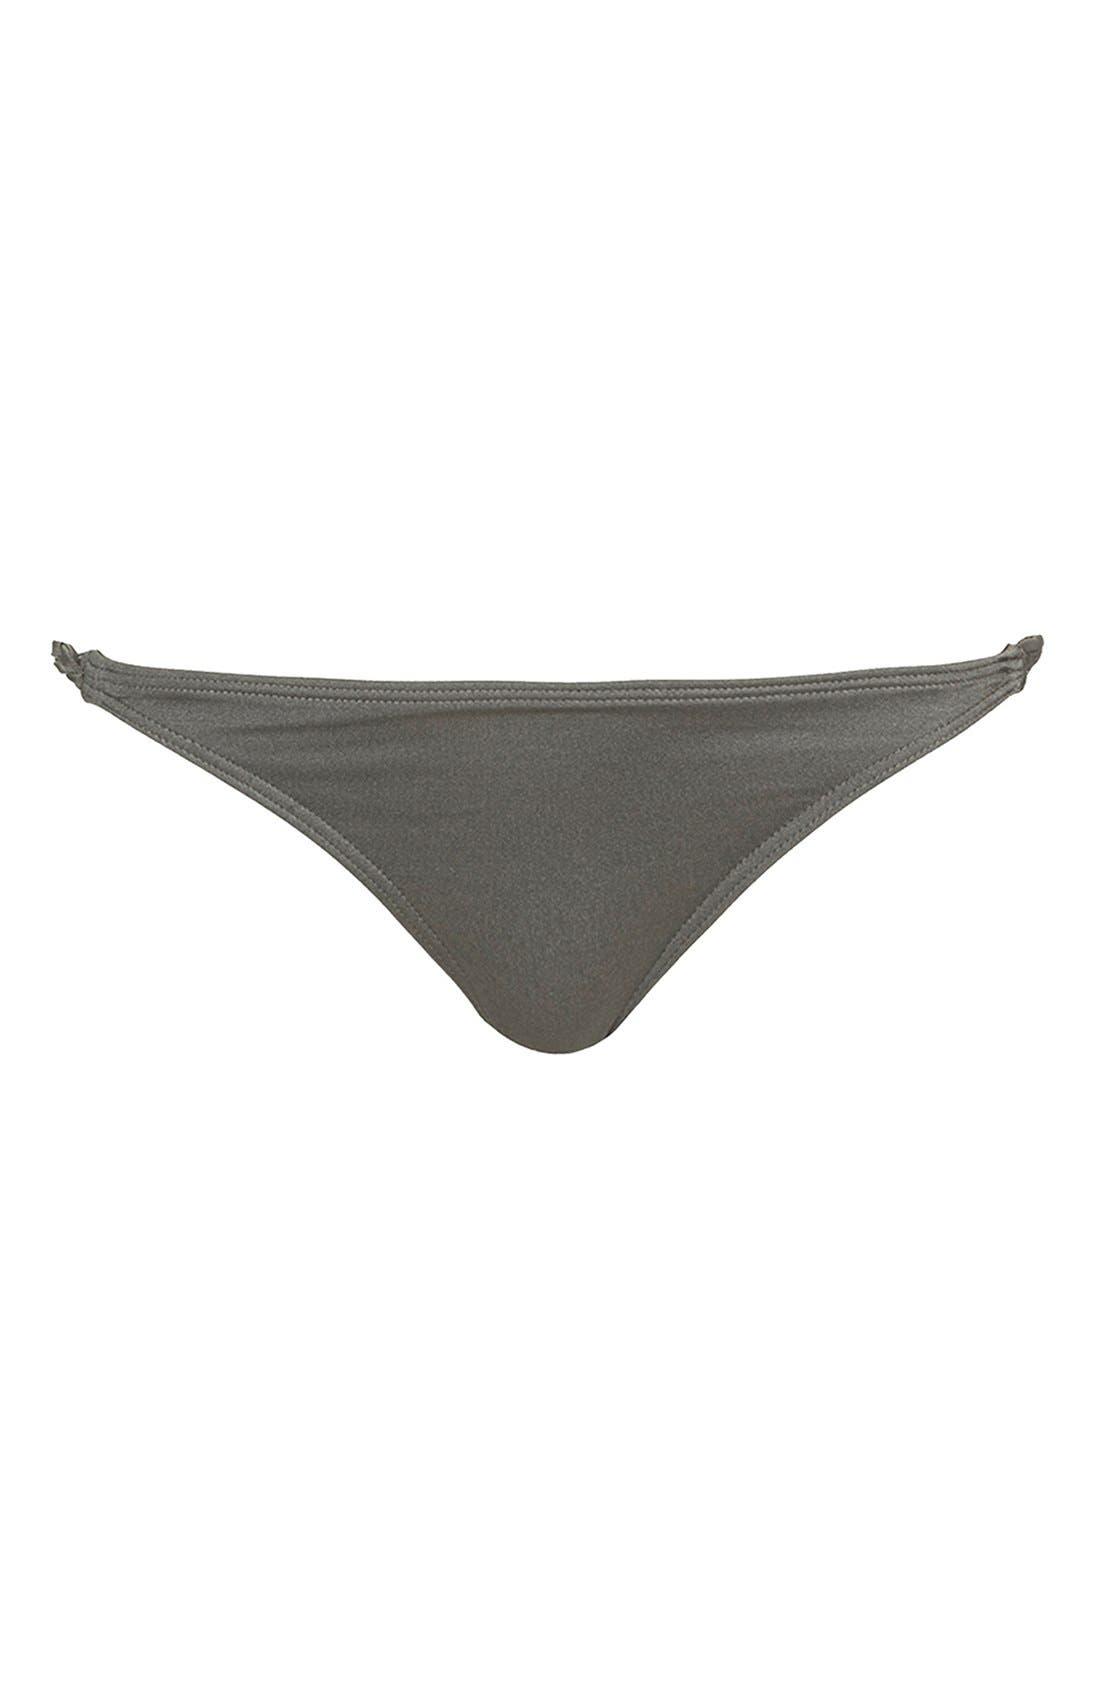 Main Image - Topshop 'Sophis' Bikini Bottoms